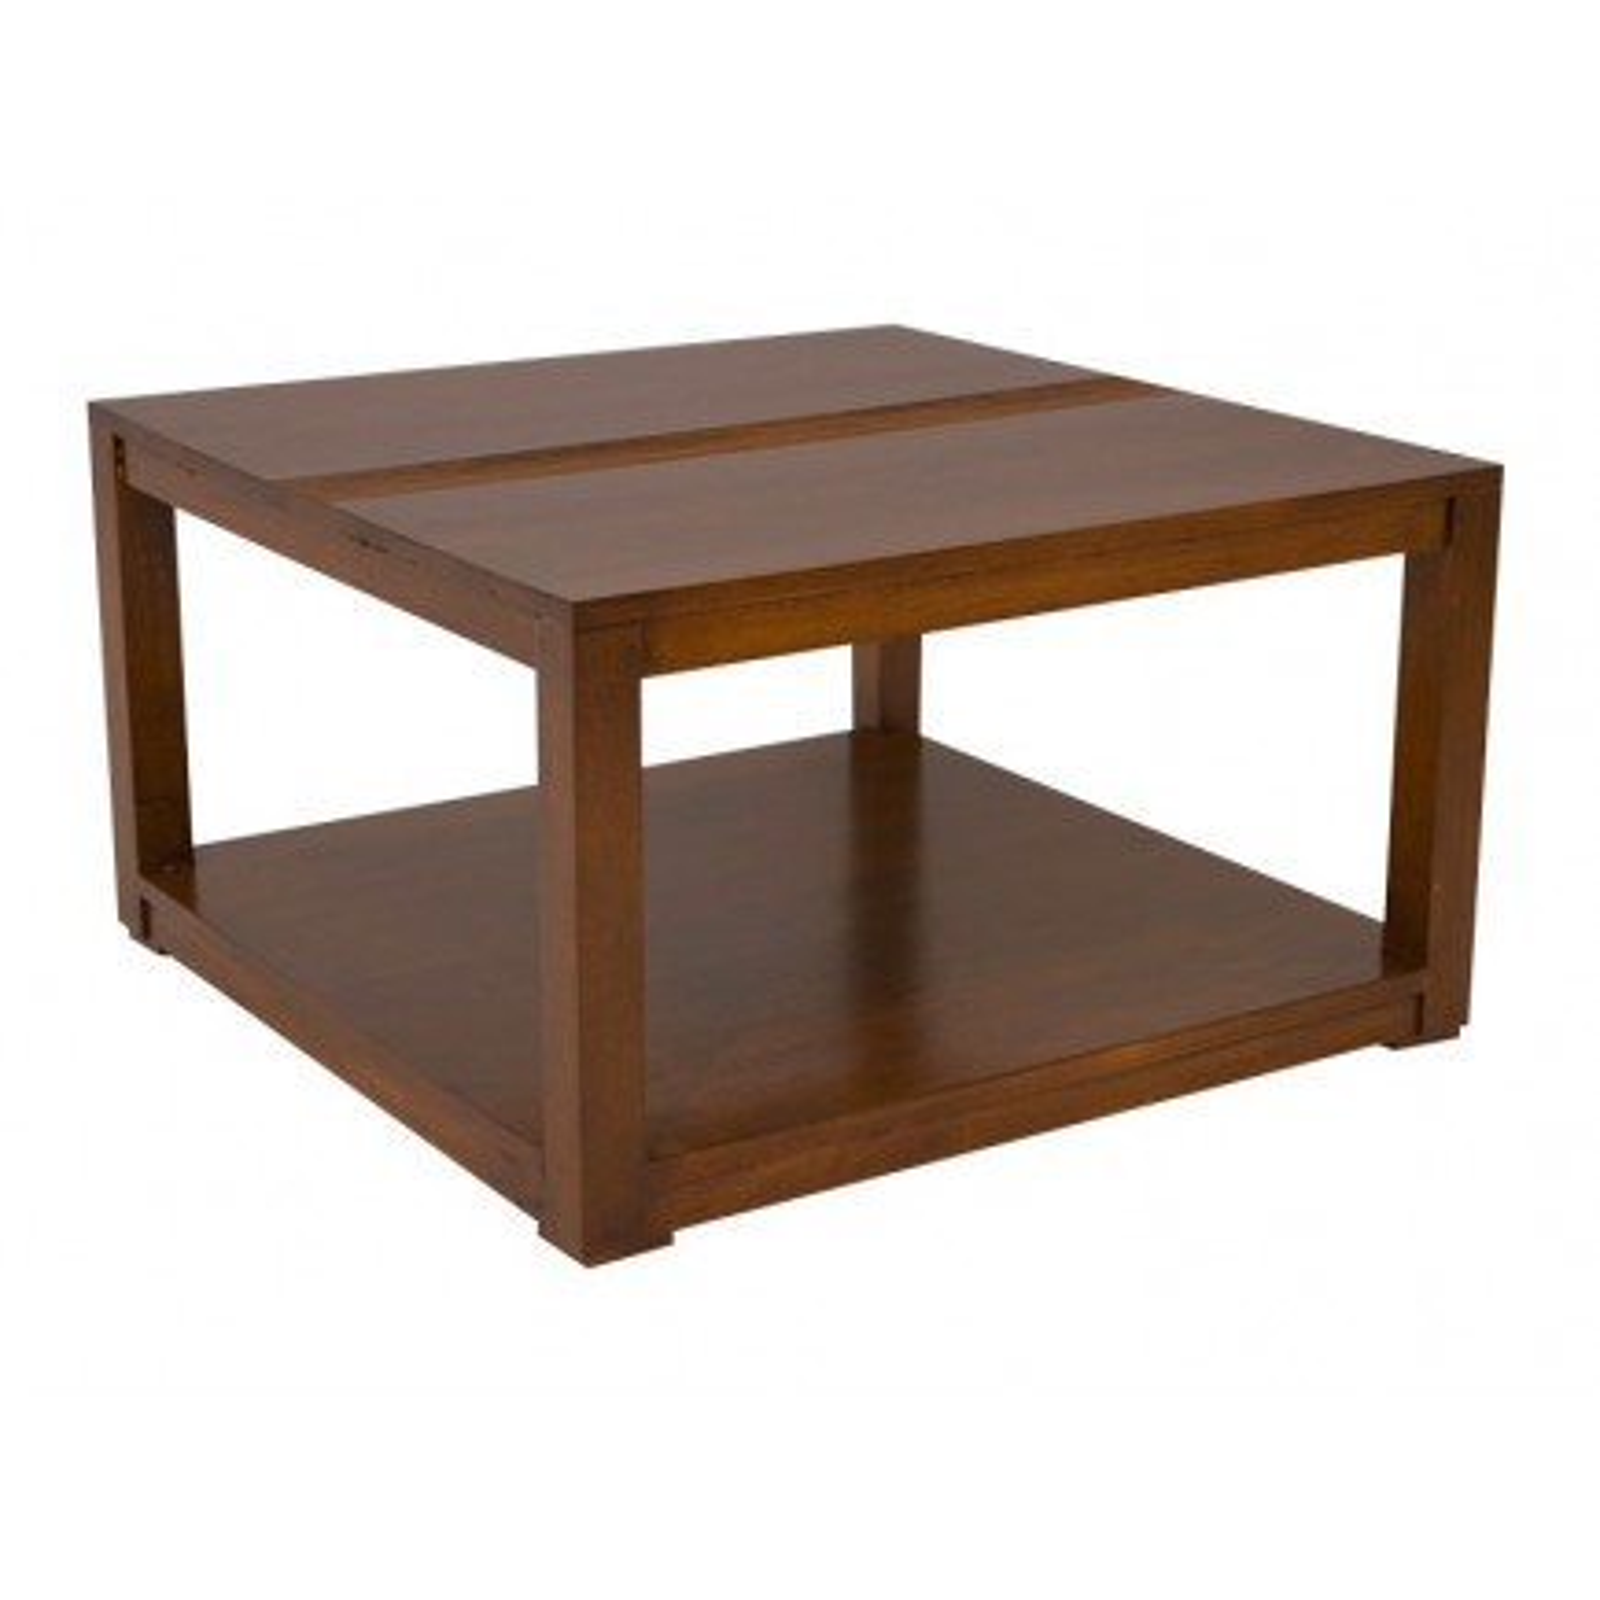 Table Basse Siguiri Hévéa - meuble bois massif